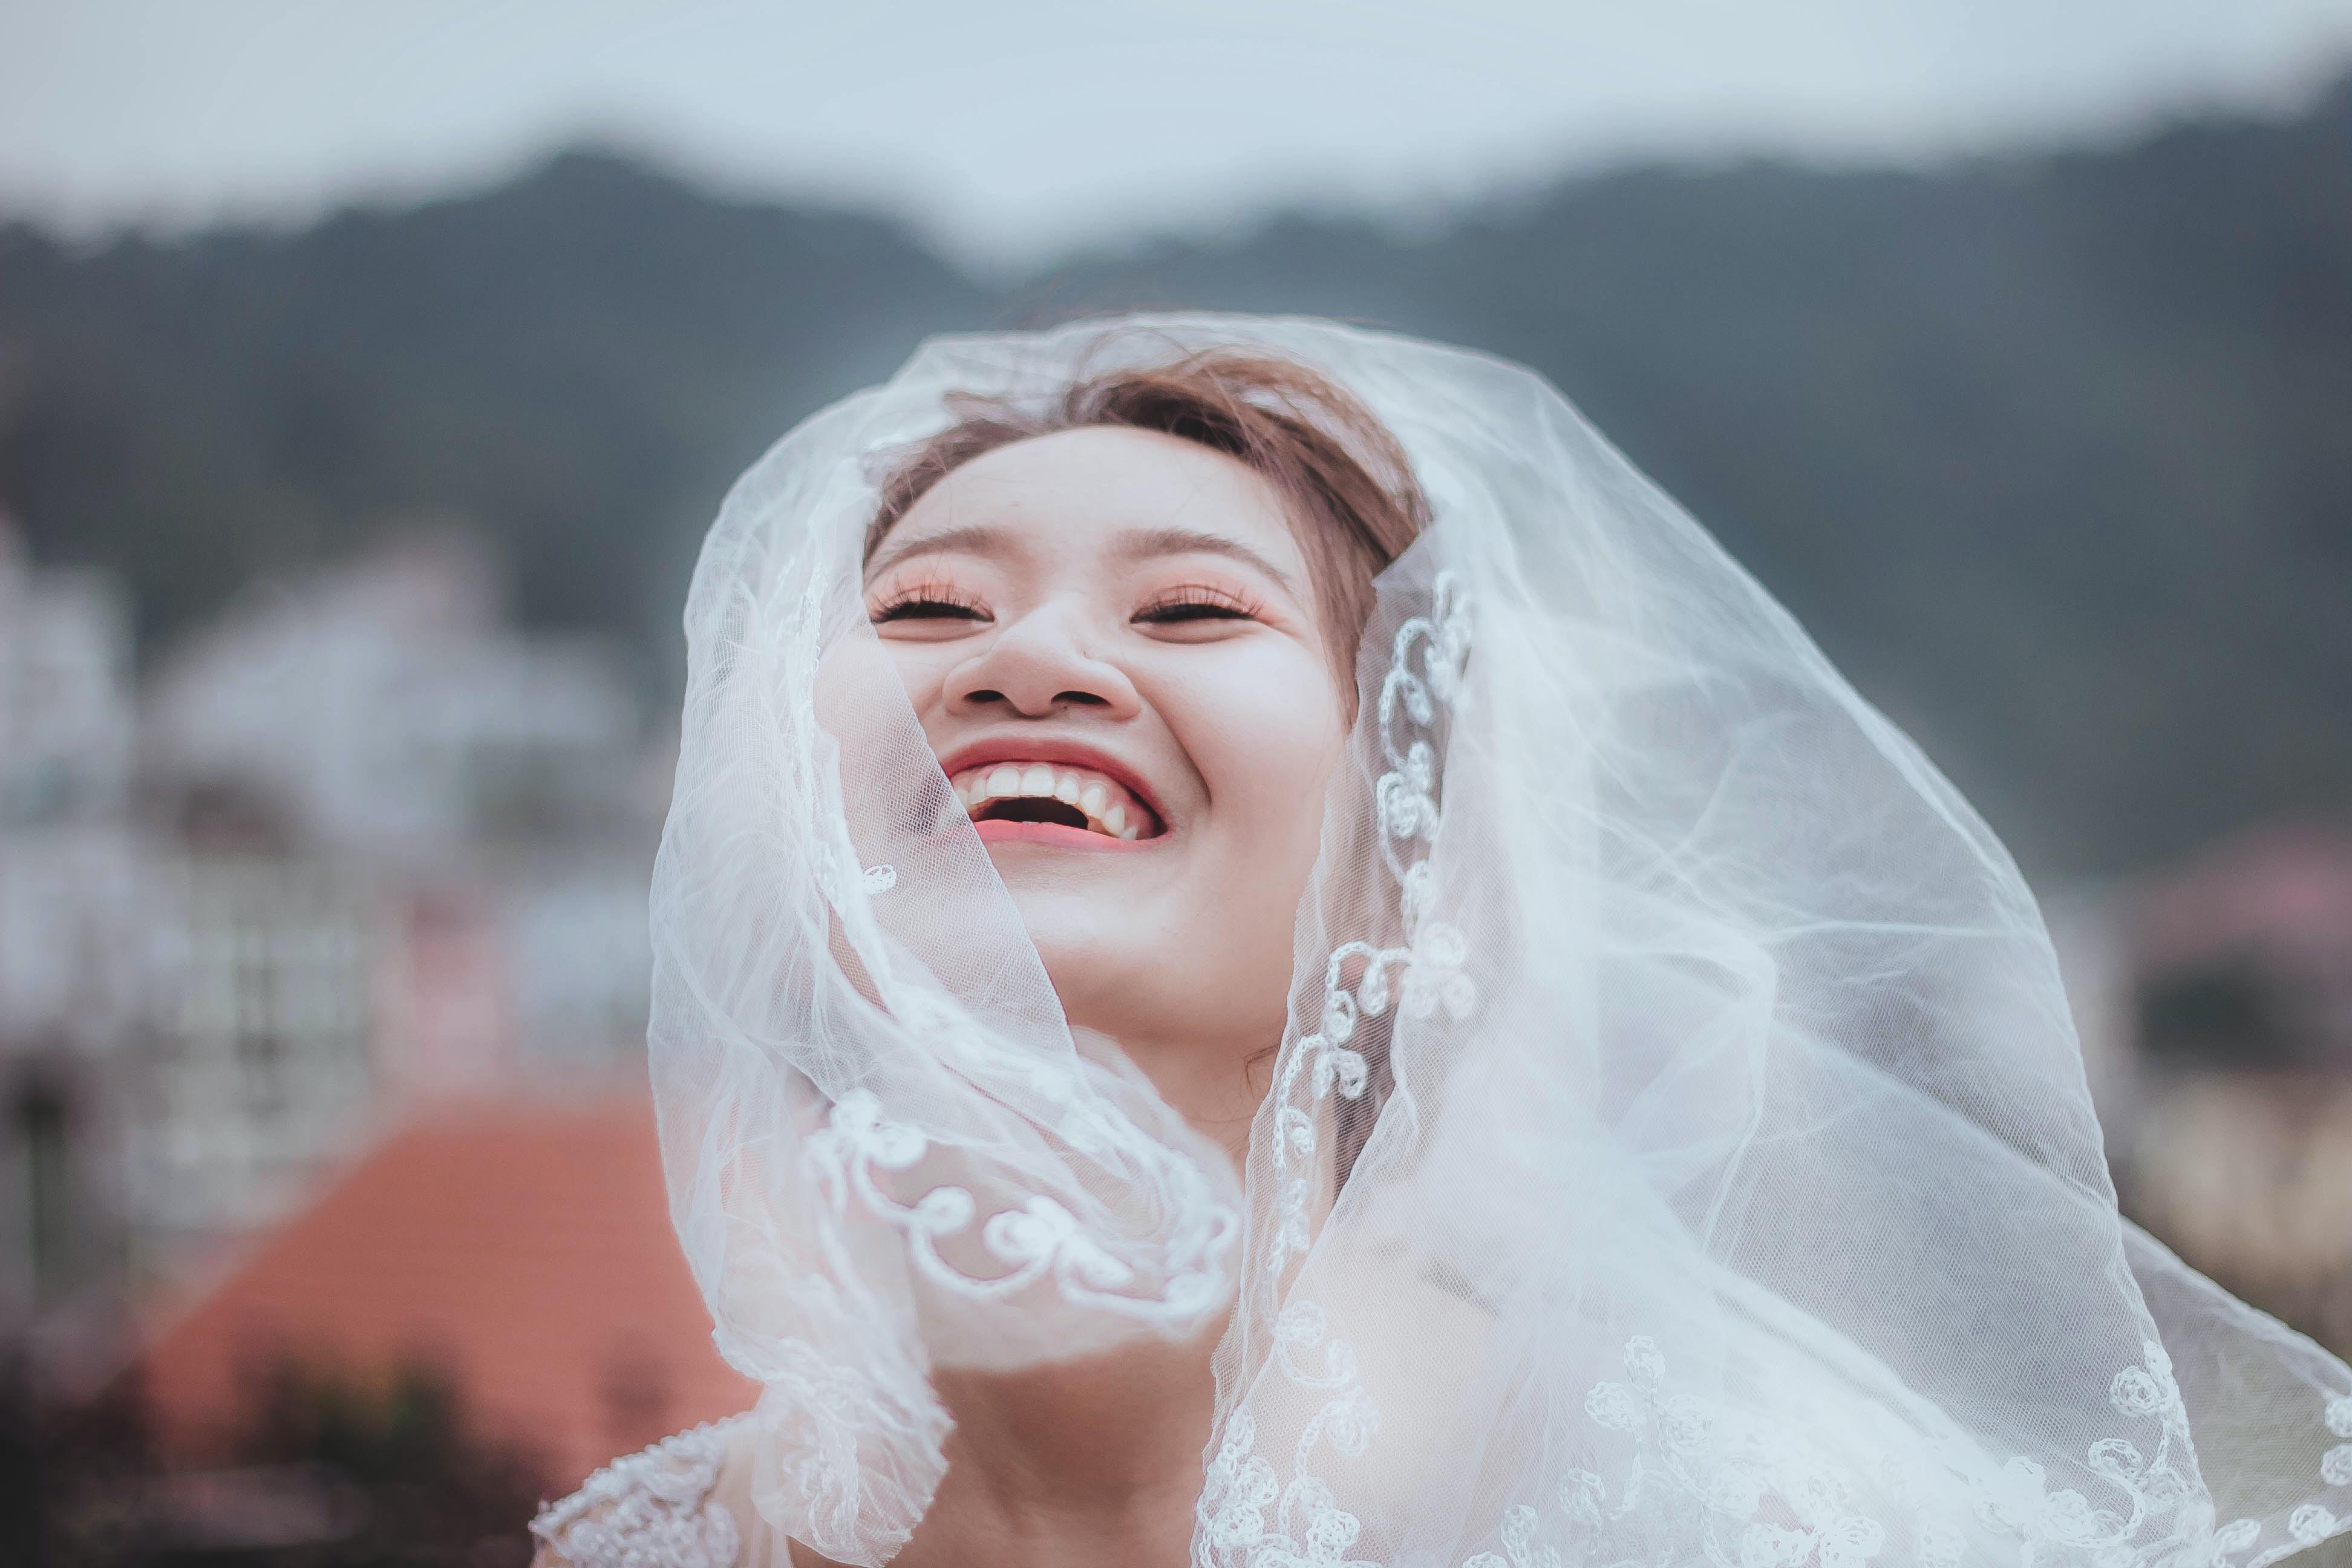 woman wearing white lace wedding veil